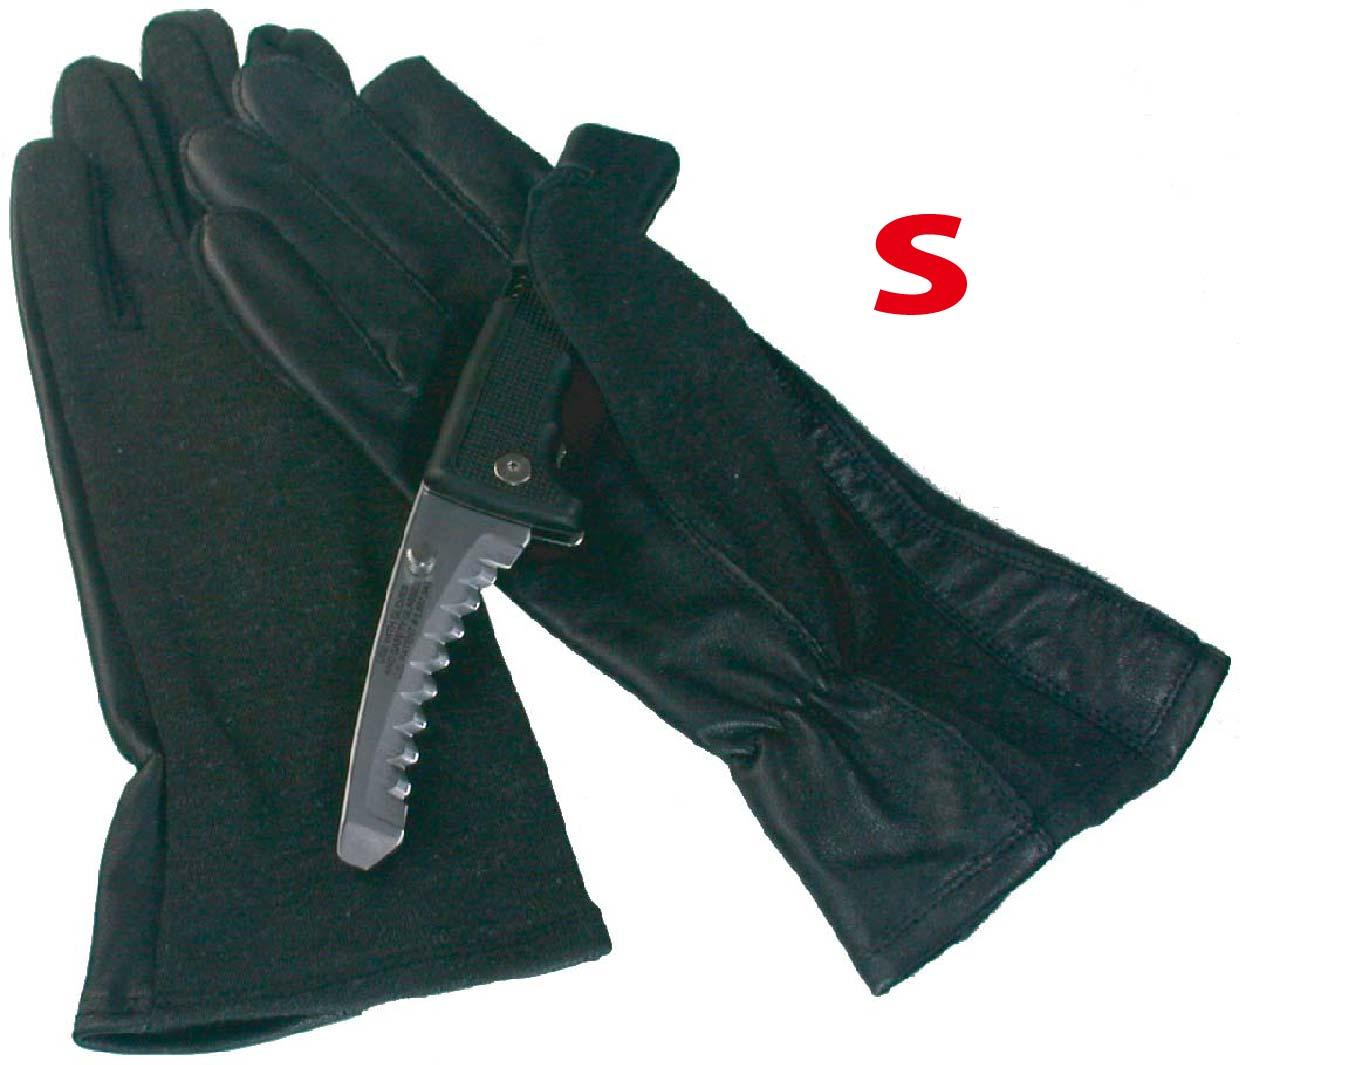 MIL-FORCE ミルフォース ノーメックス/本革 パイロットグラブ  手袋 ブラック Sサイズ PG-05P-BK-S